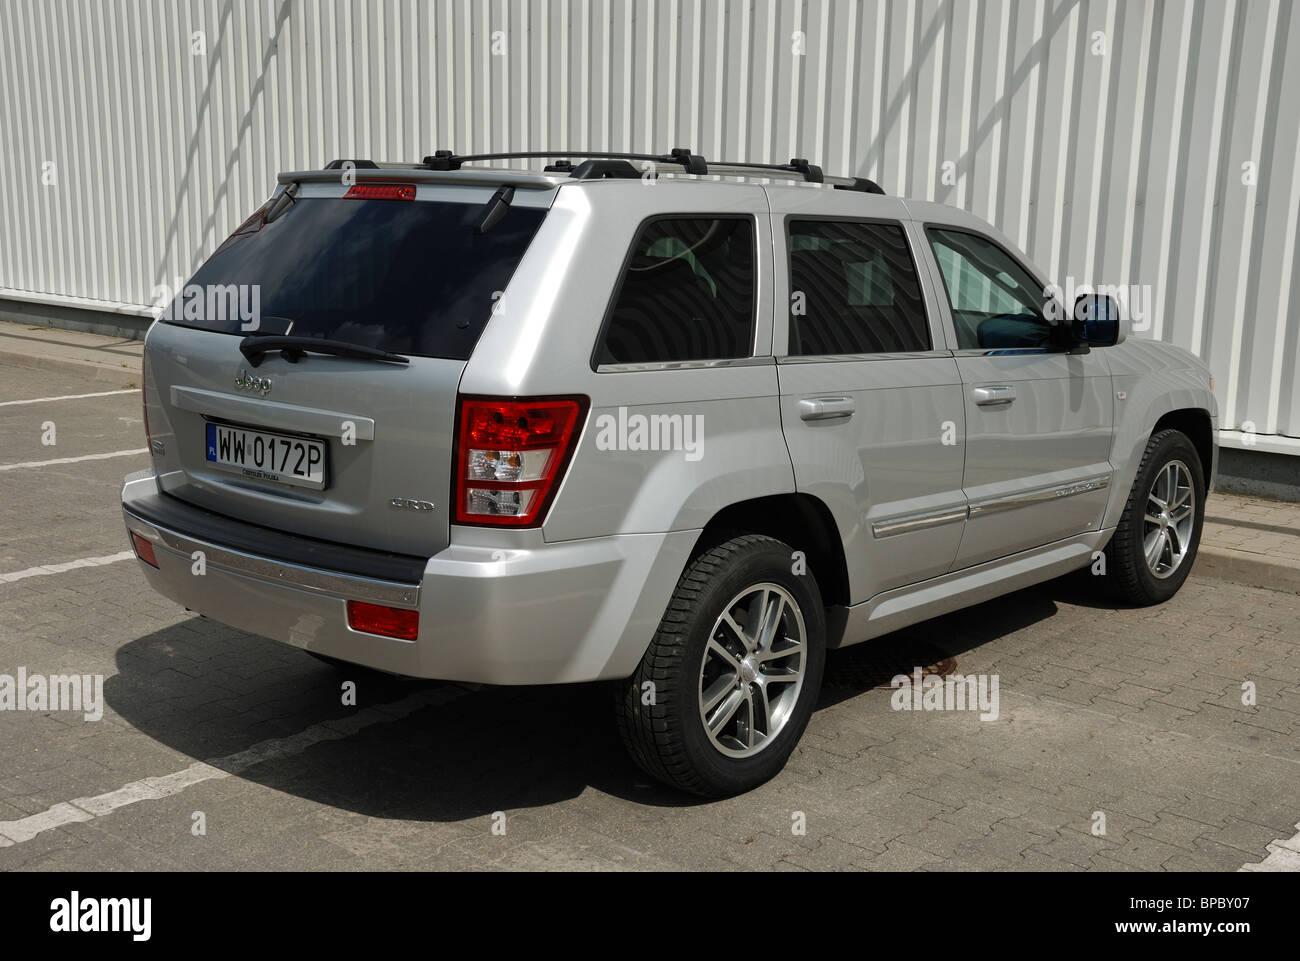 jeep grand cherokee 3.0 crd - meinestadt 2005 (wk) - silber metallic